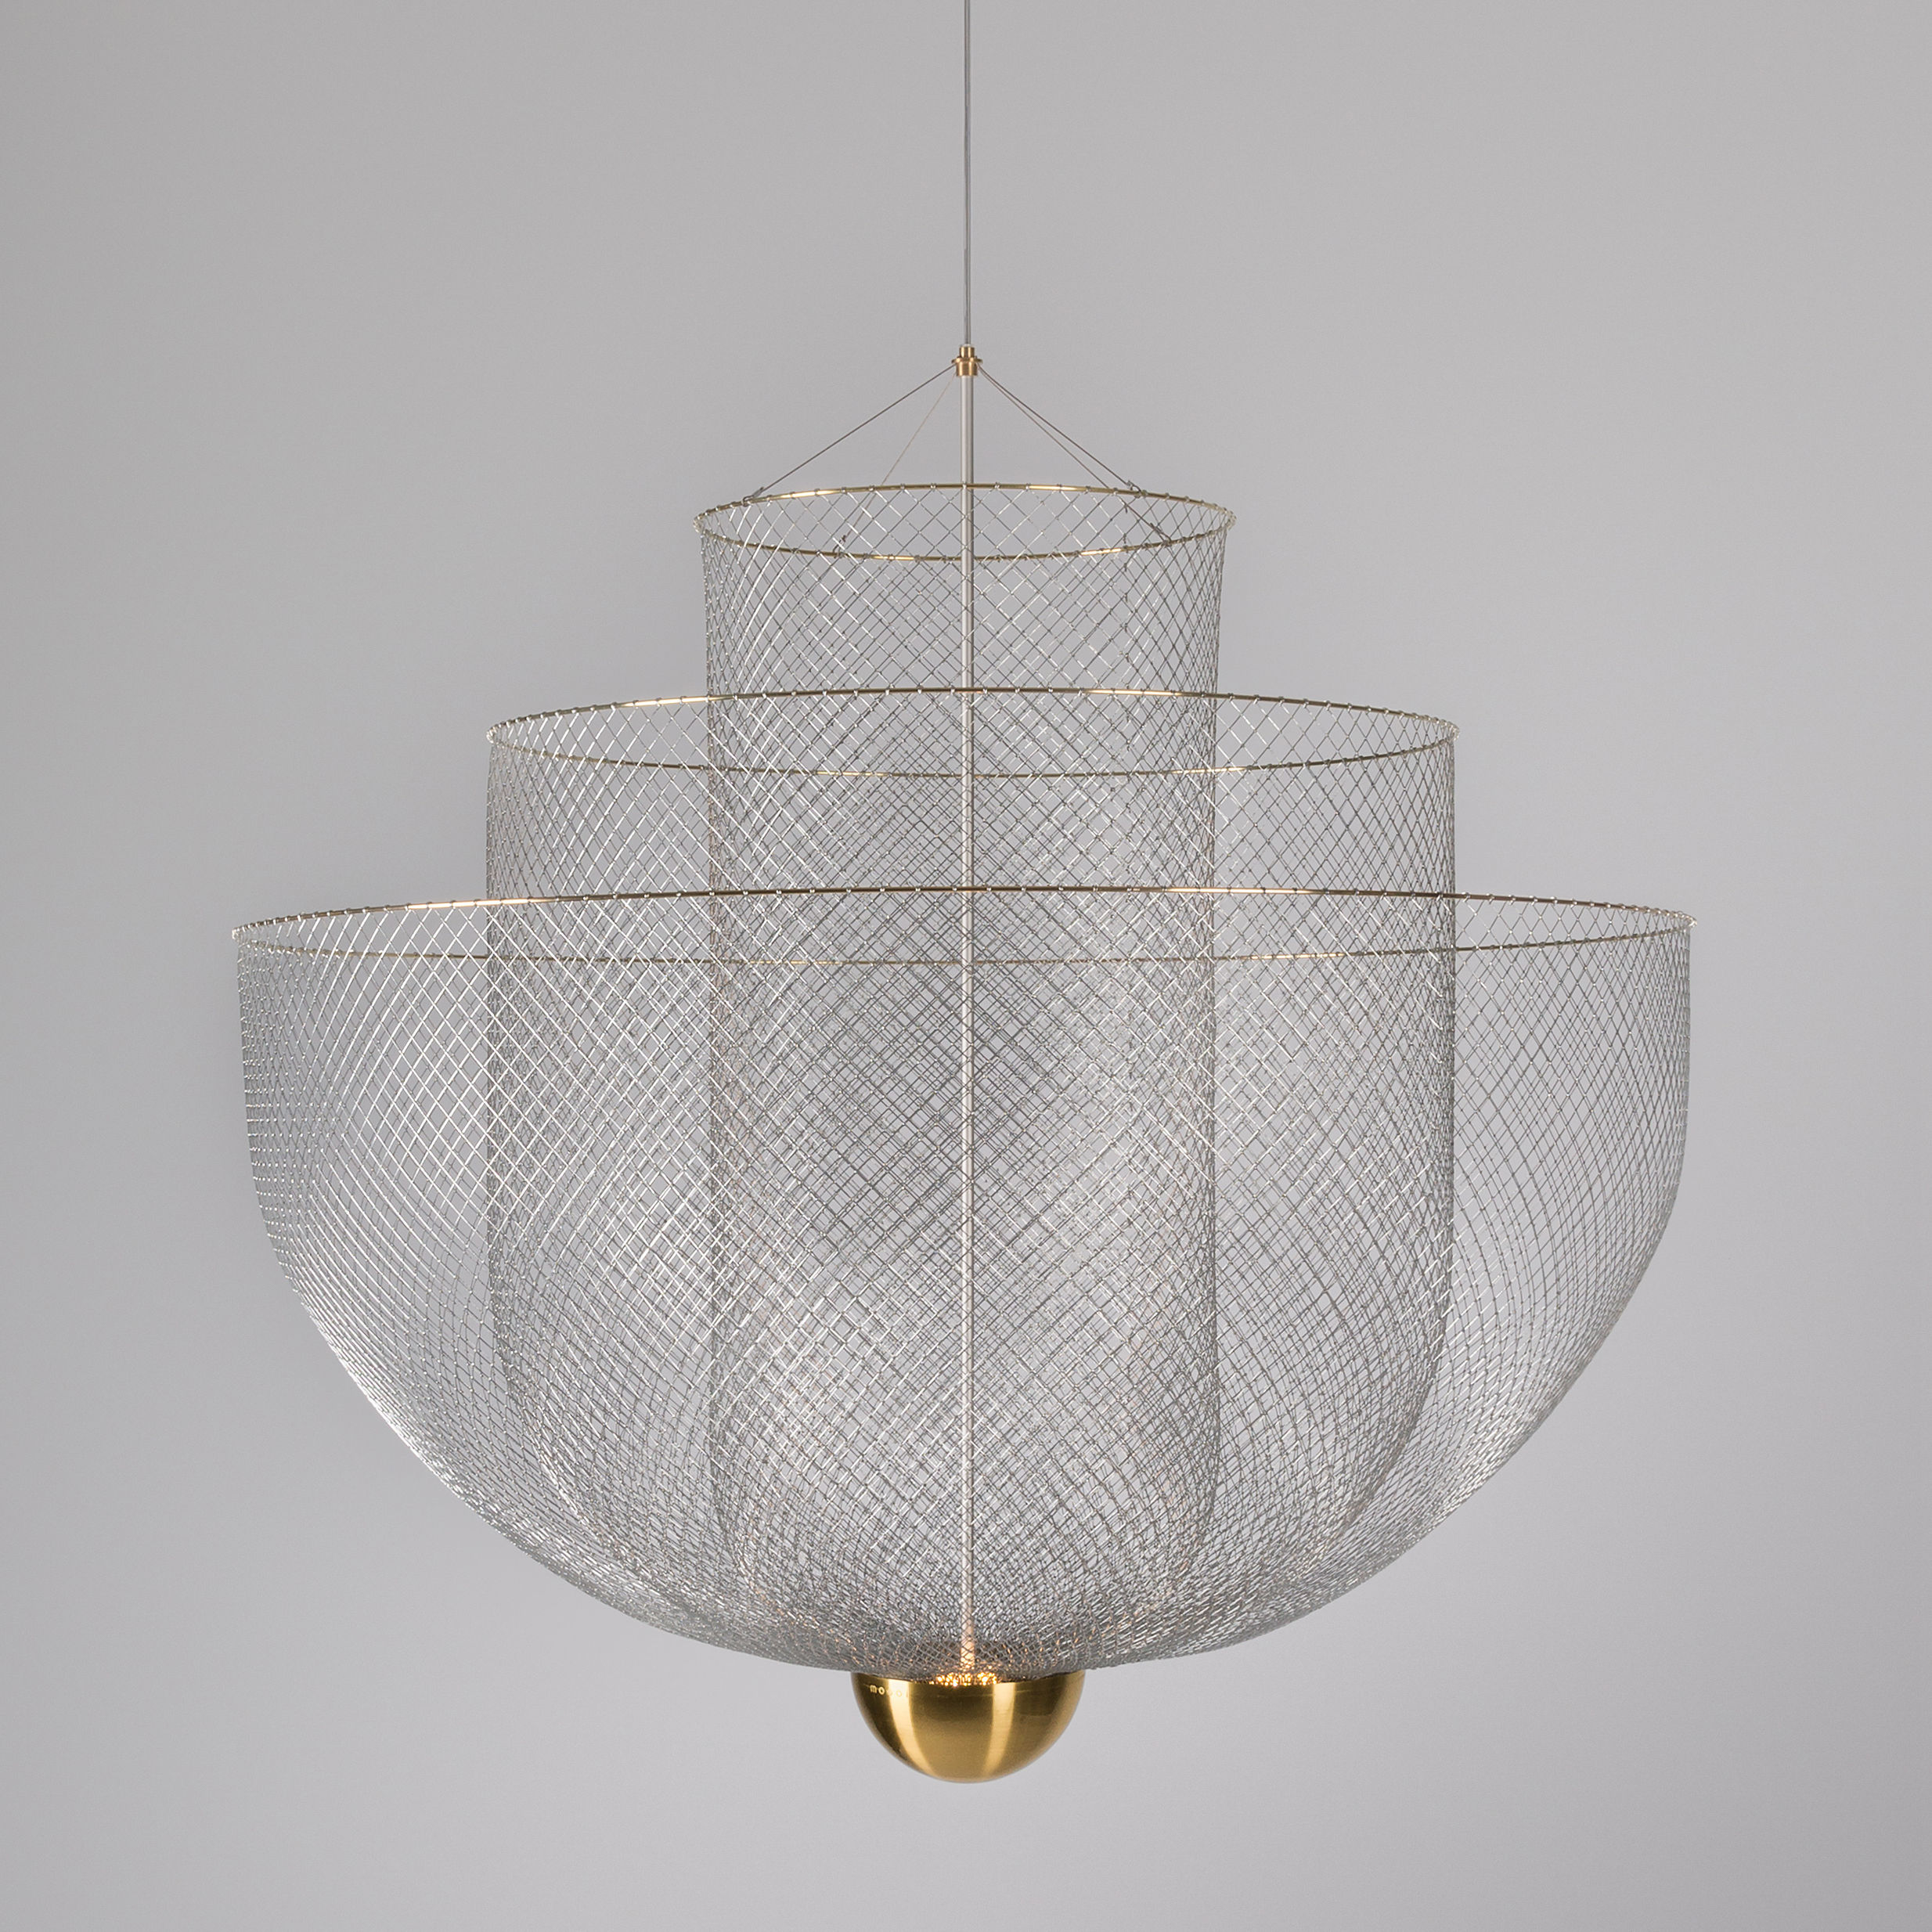 Lighting - Pendant Lighting - Meshmatics LED Pendant - / Ø 90 cm - Steel mesh by Moooi - Steel & brass - Brass, Grillage d'acier galvanisé